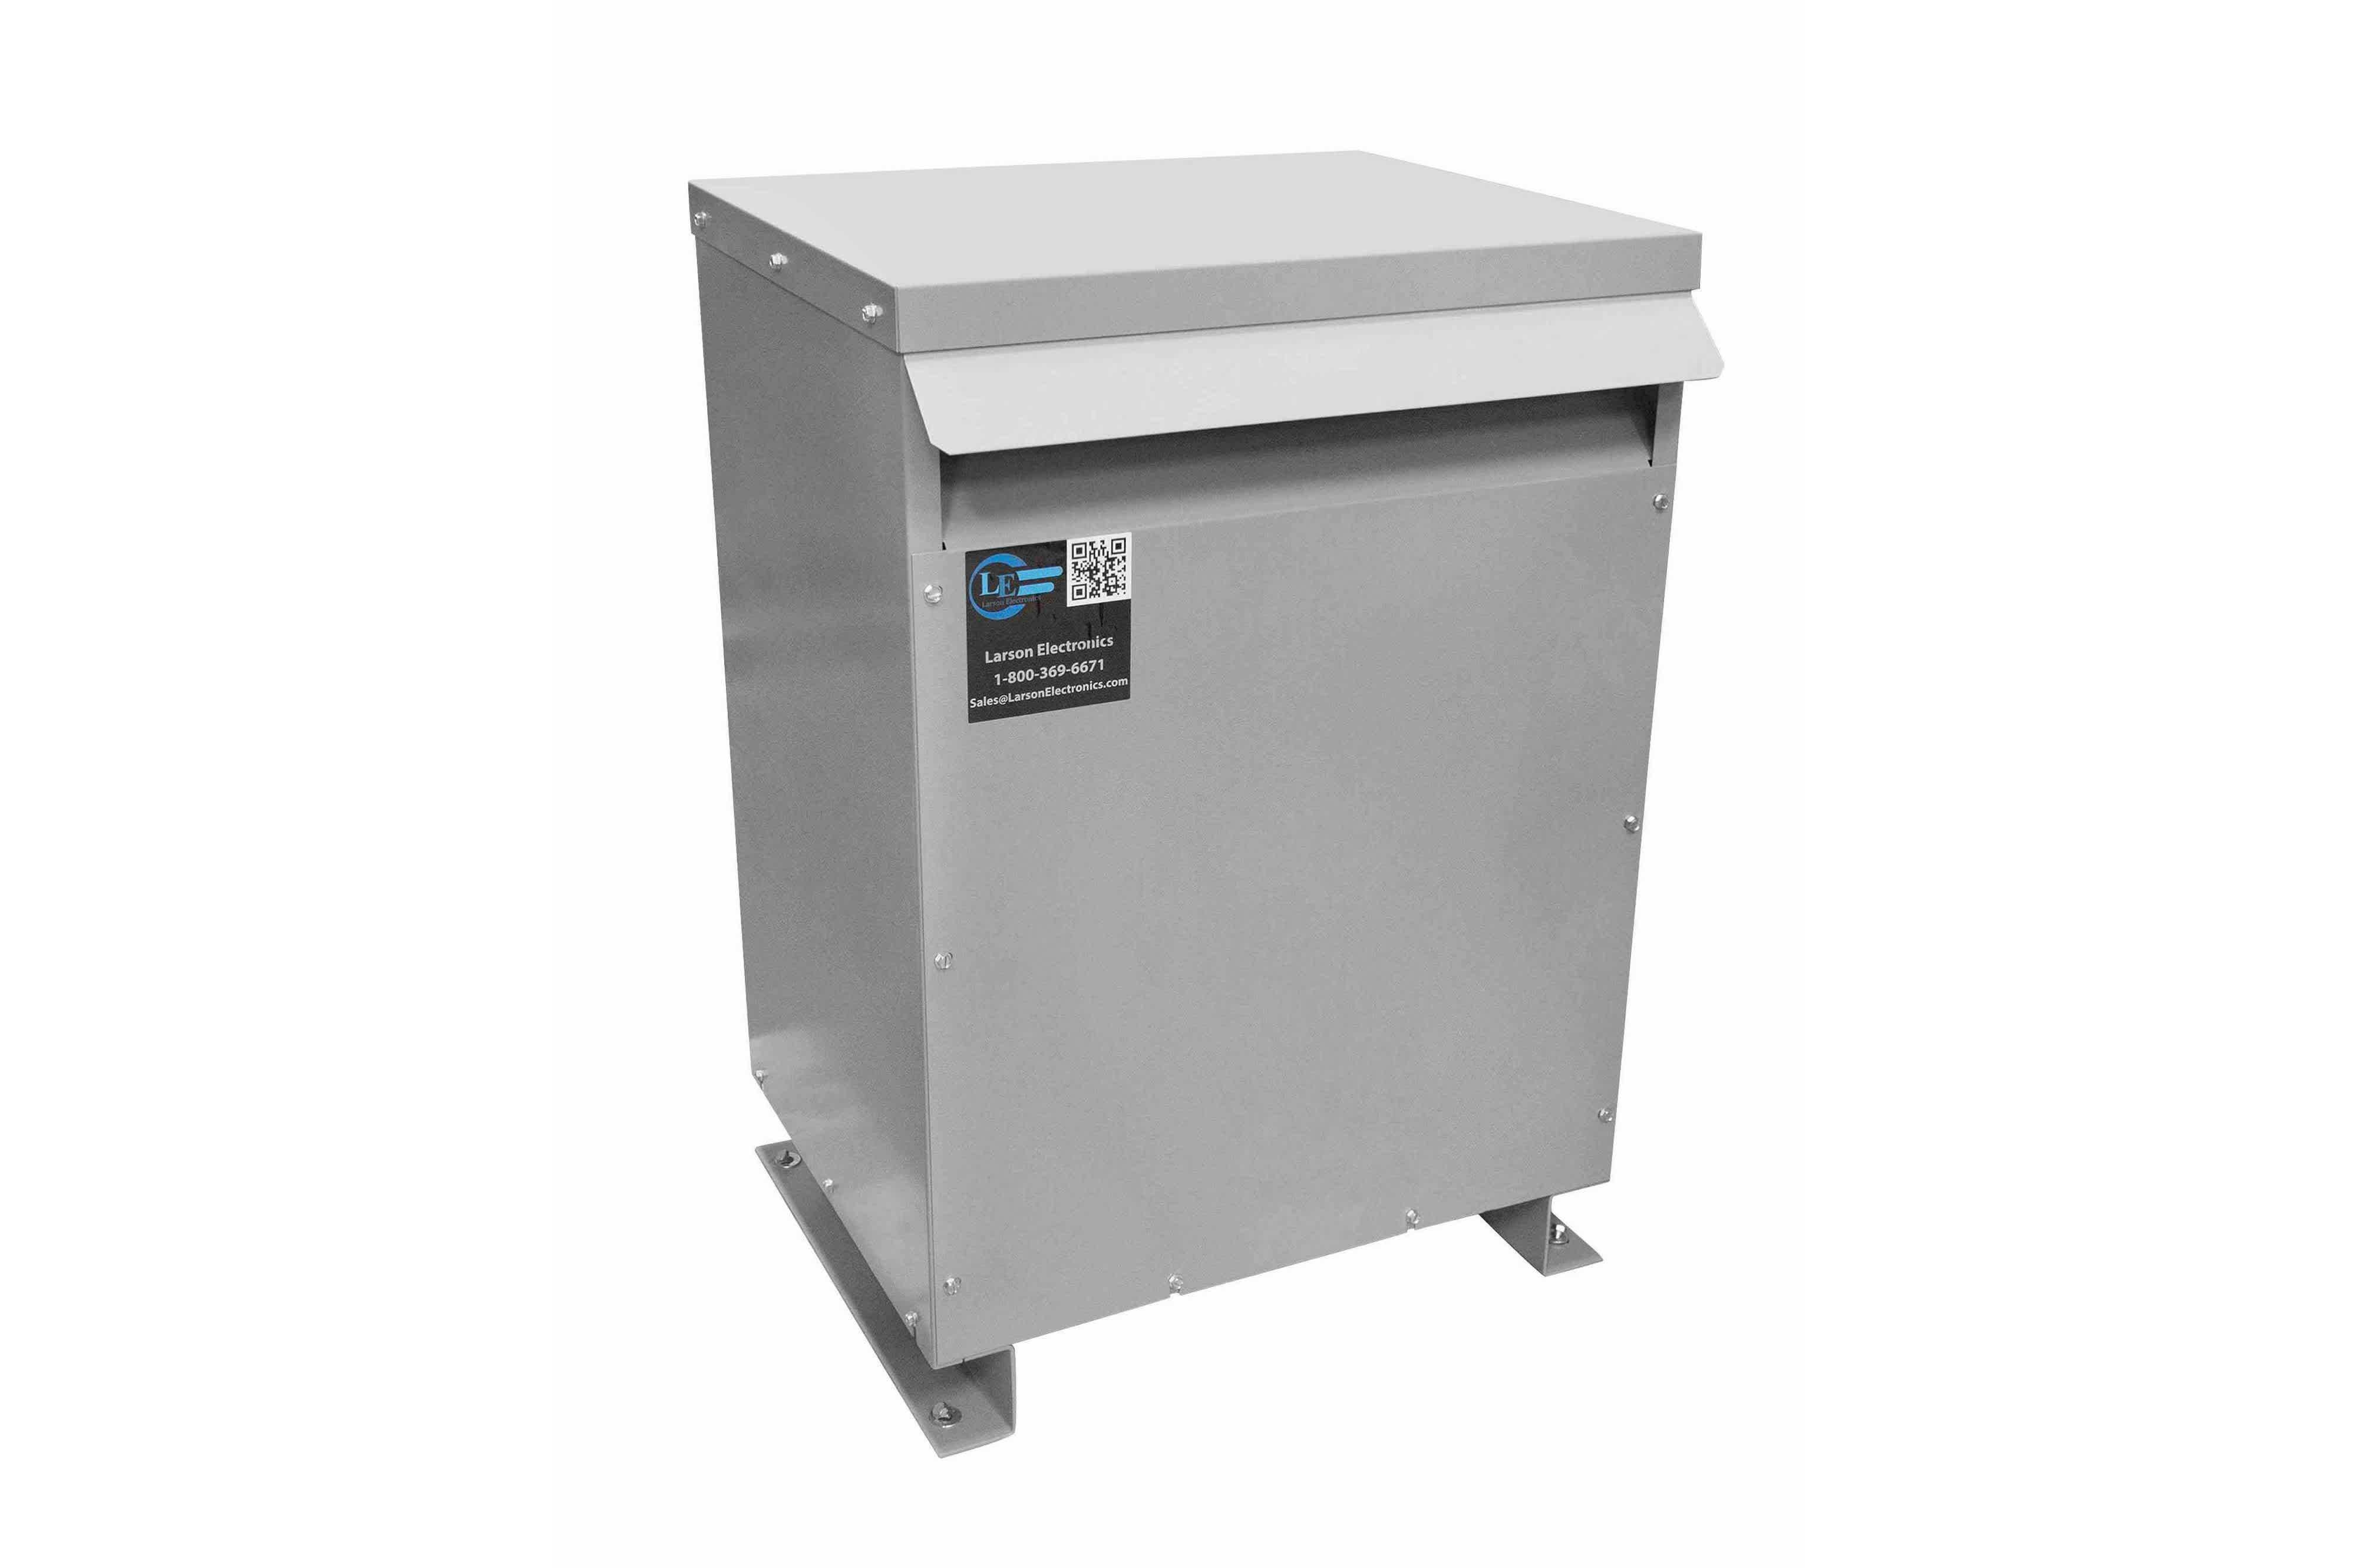 90 kVA 3PH Isolation Transformer, 240V Wye Primary, 600V Delta Secondary, N3R, Ventilated, 60 Hz